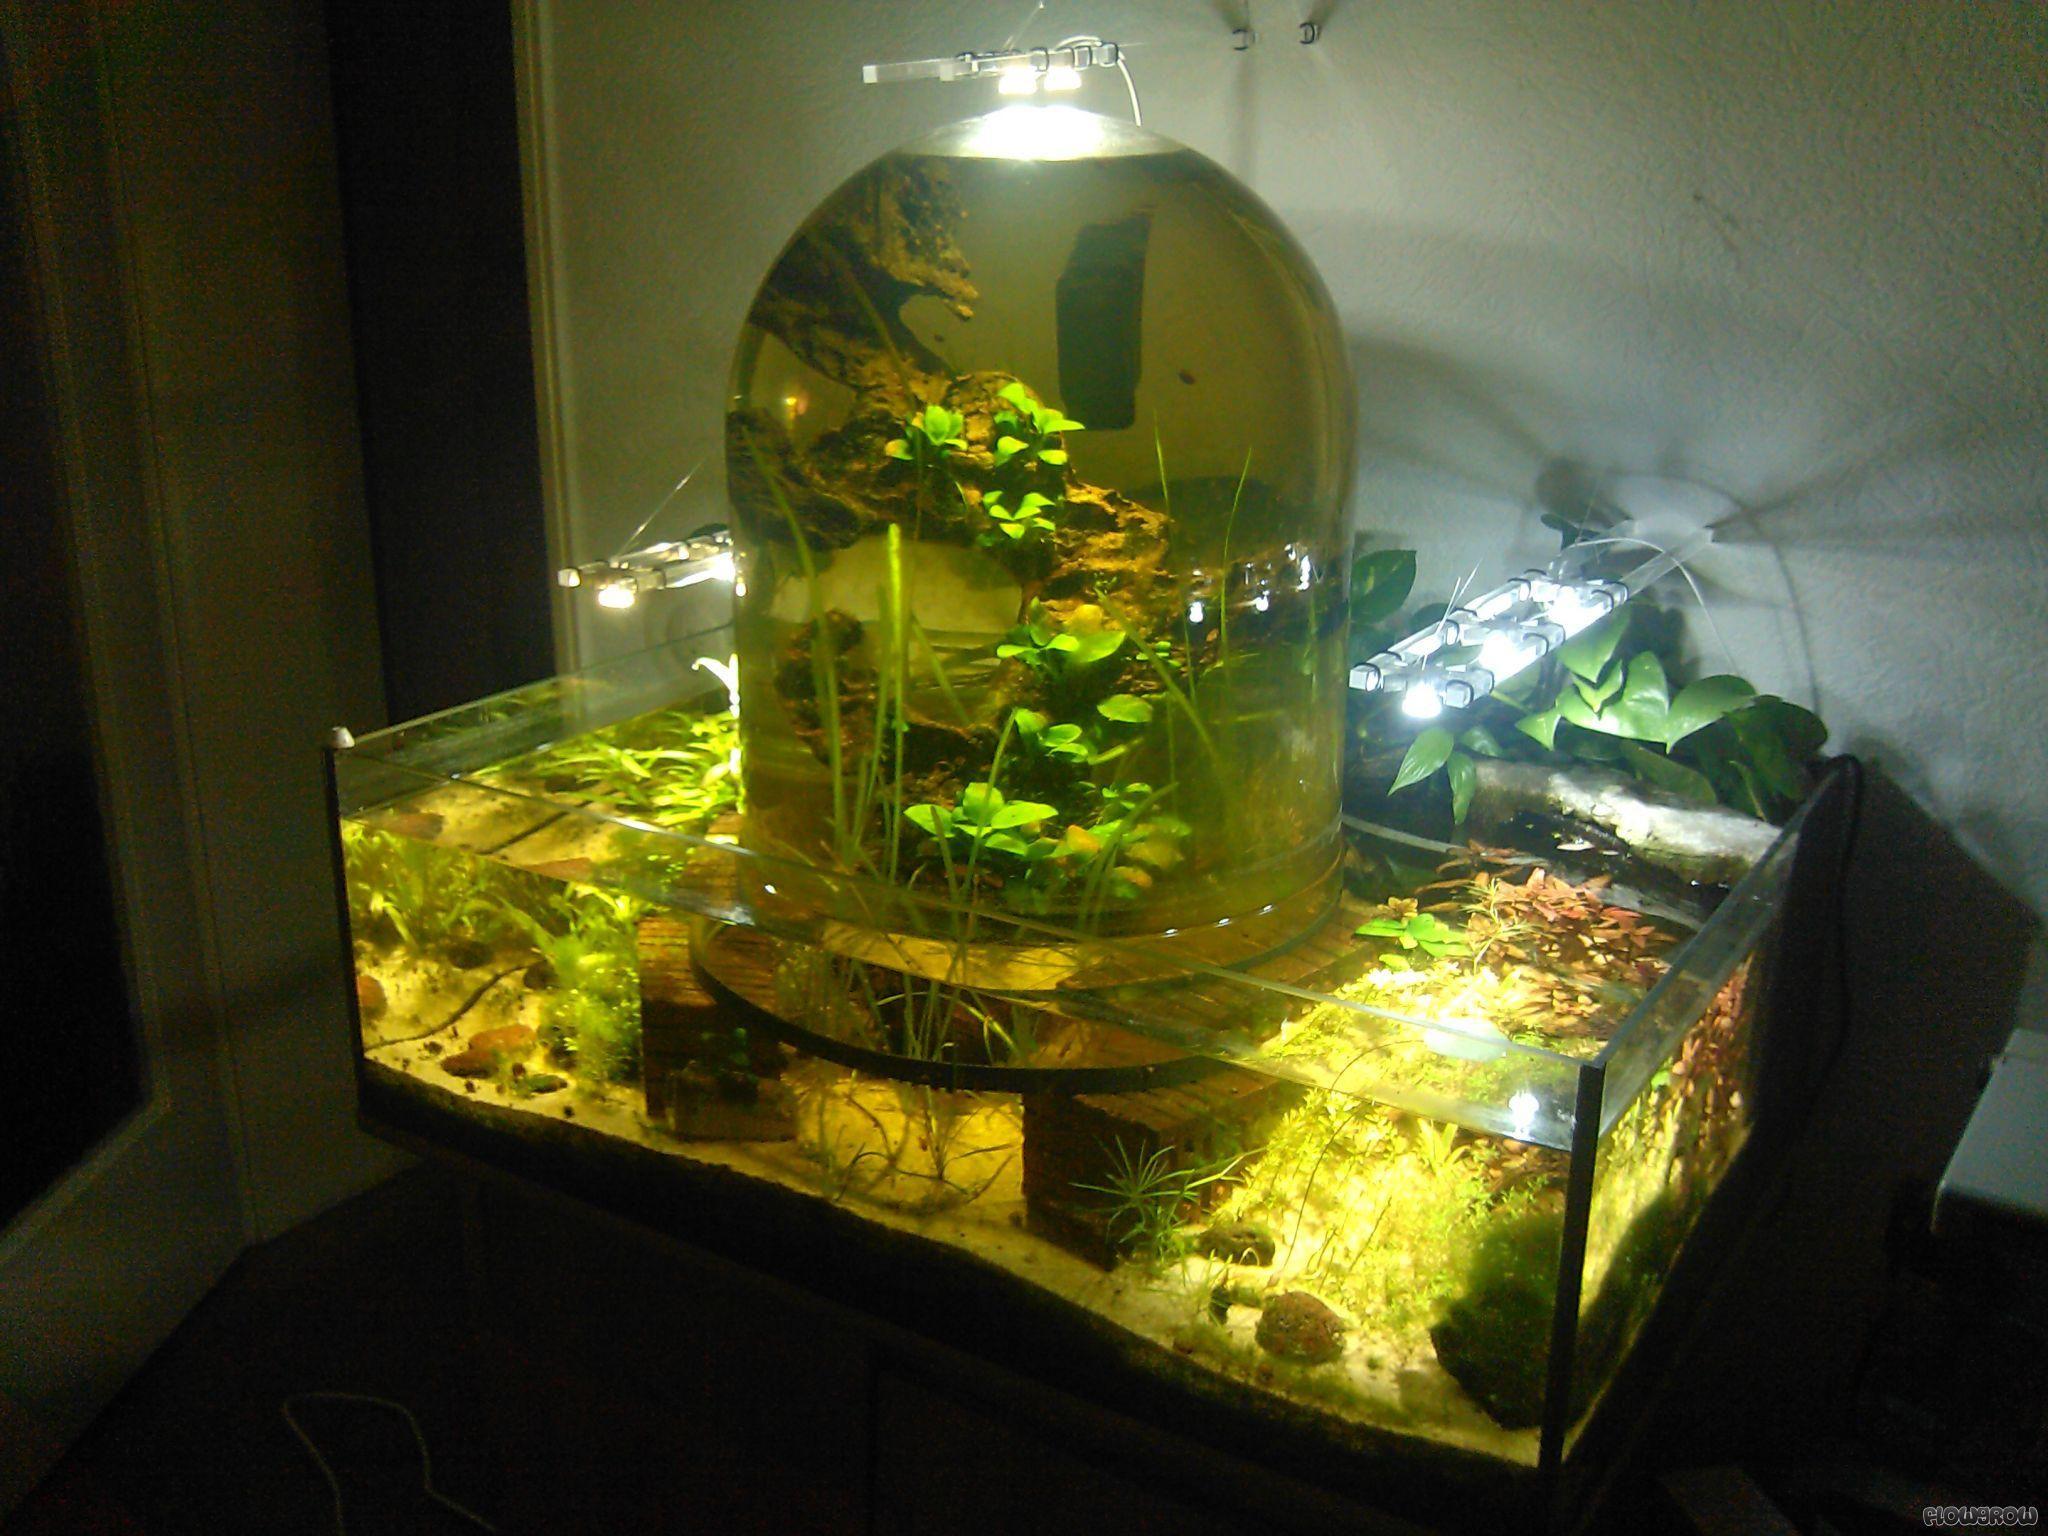 Aquarium selber bauen aquarium deko selber bauen diy ideen pinterest aquarium aquarium - Aquarium unterschrank selber bauen ...